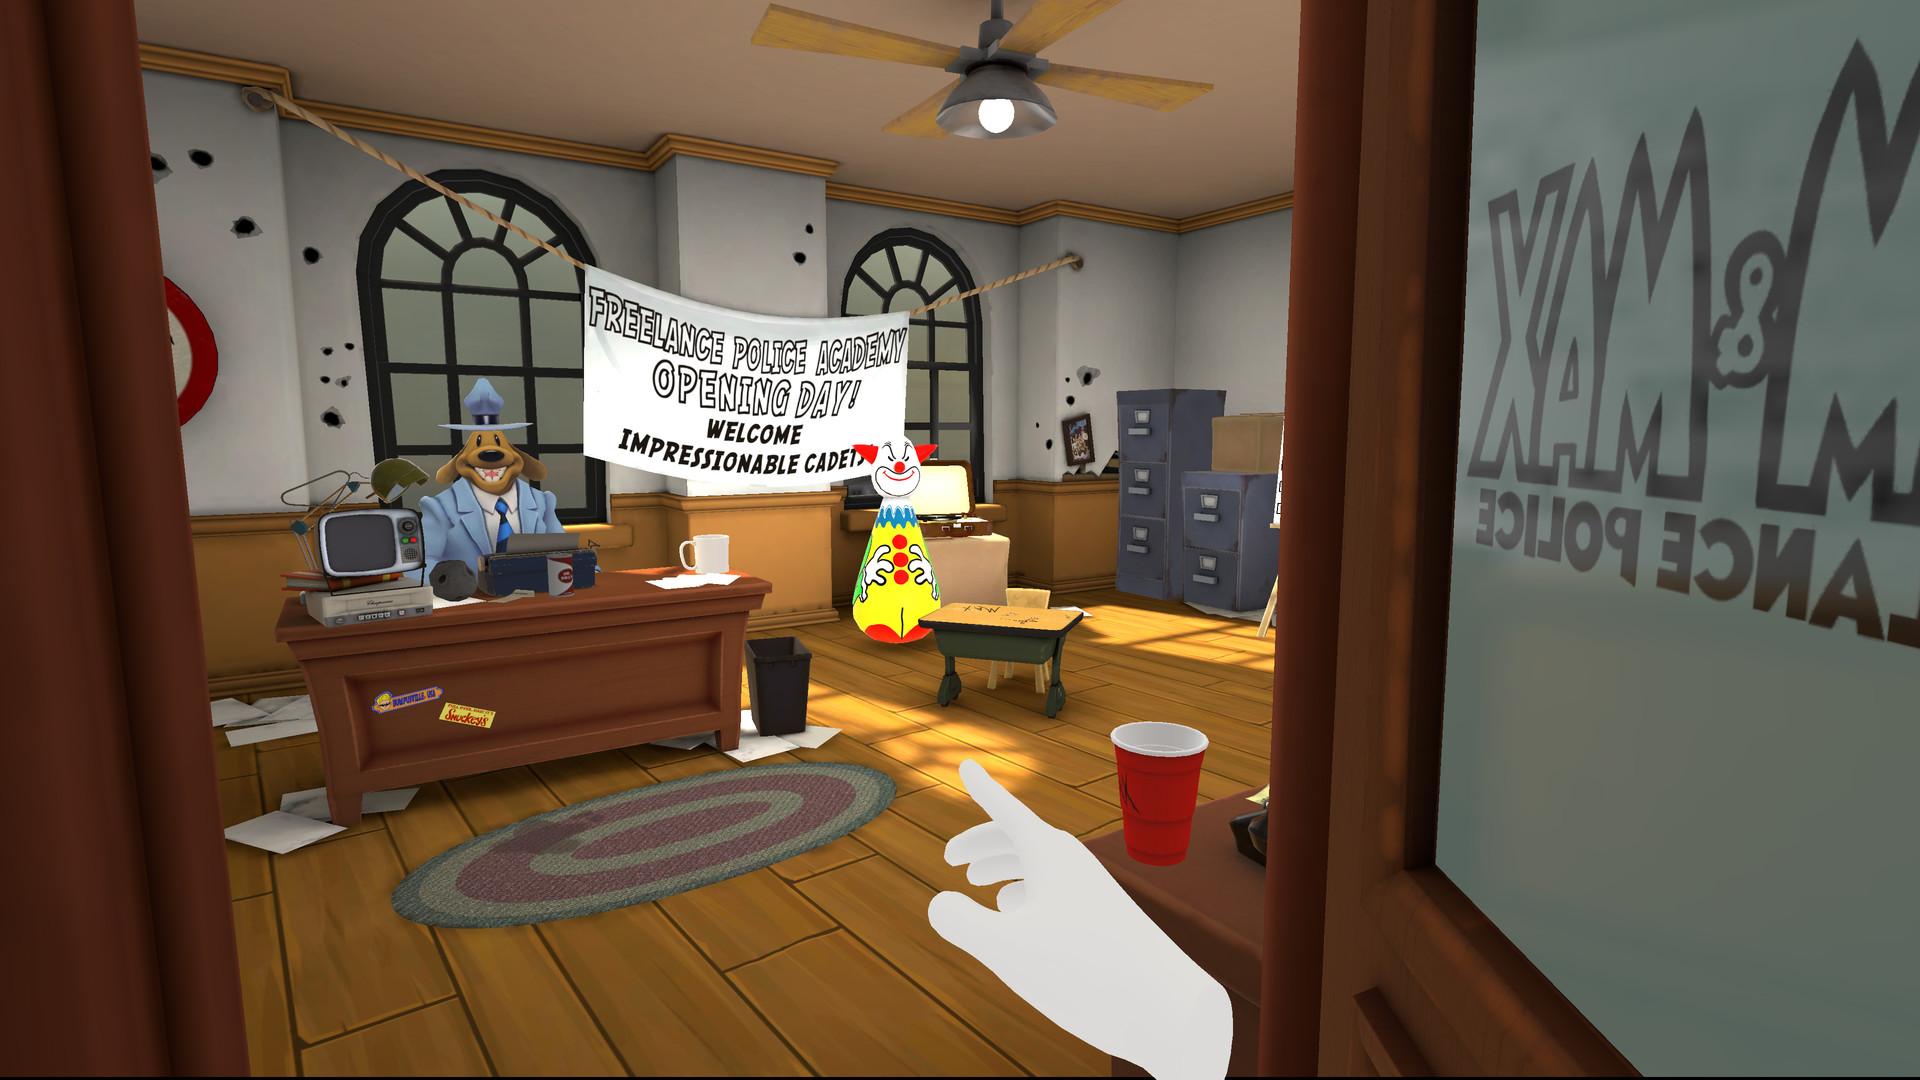 Oculus Quest 游戏《Sam & Max: This Time It's Virtual!》山姆和麦克斯:虚拟警探插图(1)